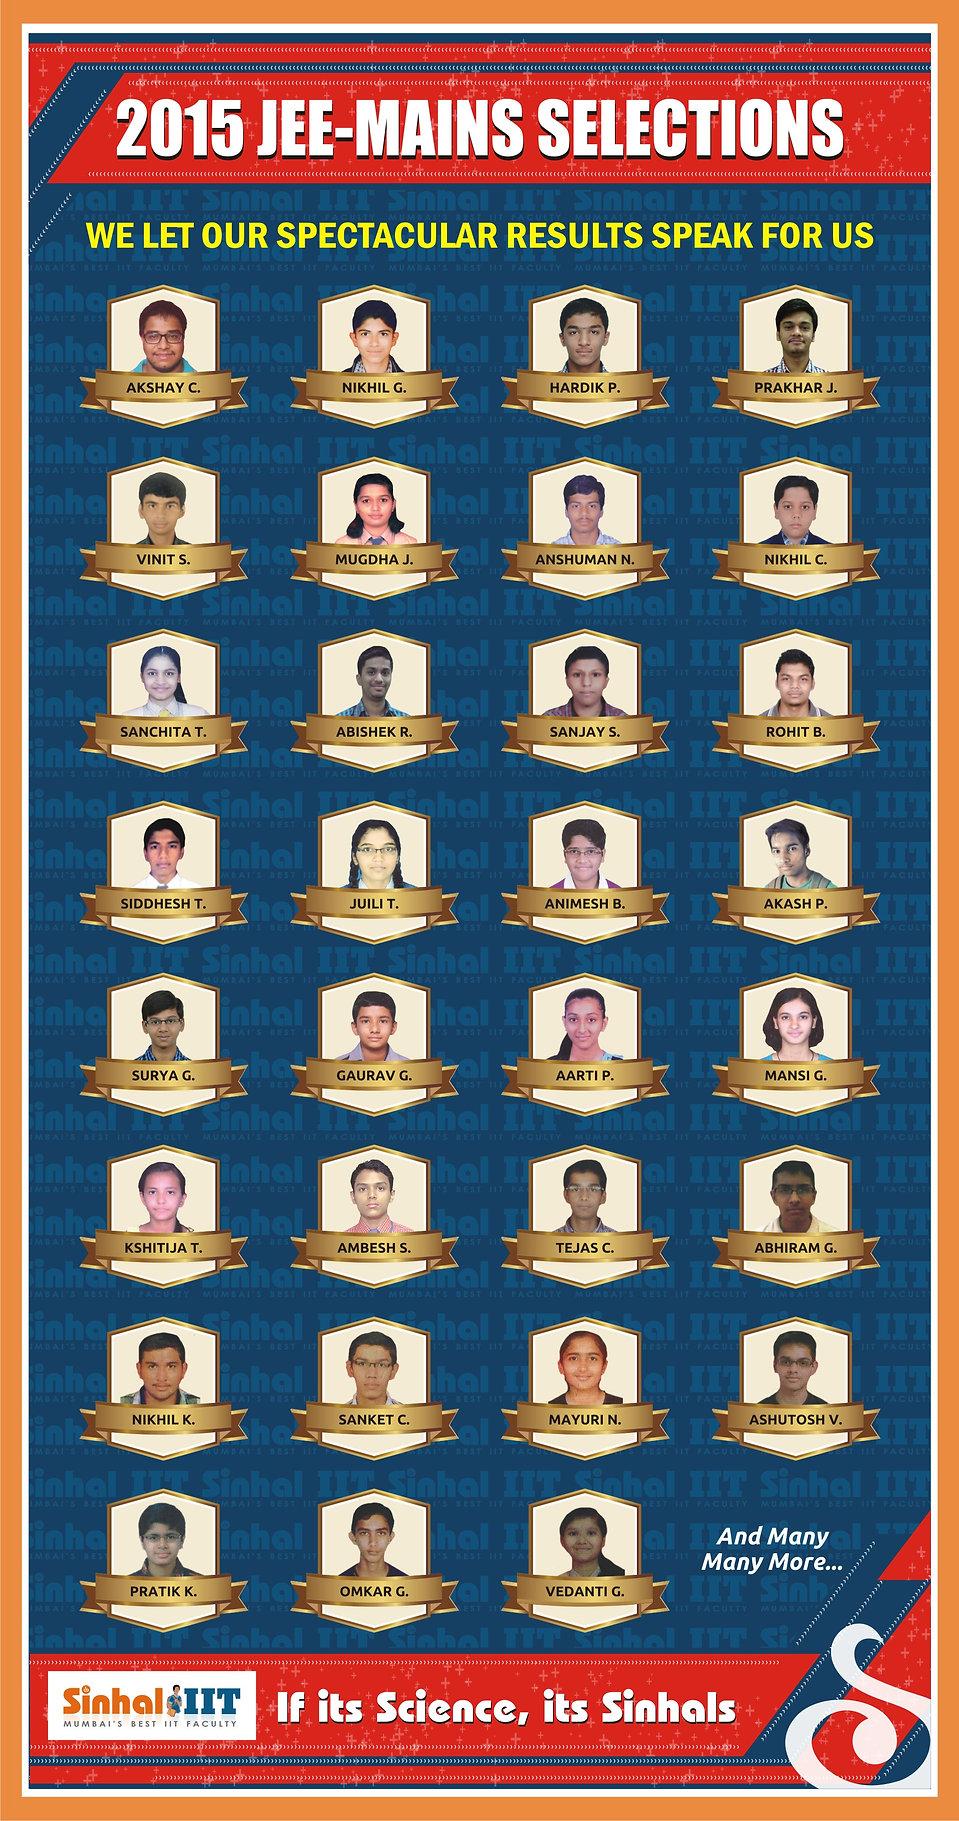 JEE-Mains-Results-2015.jpg